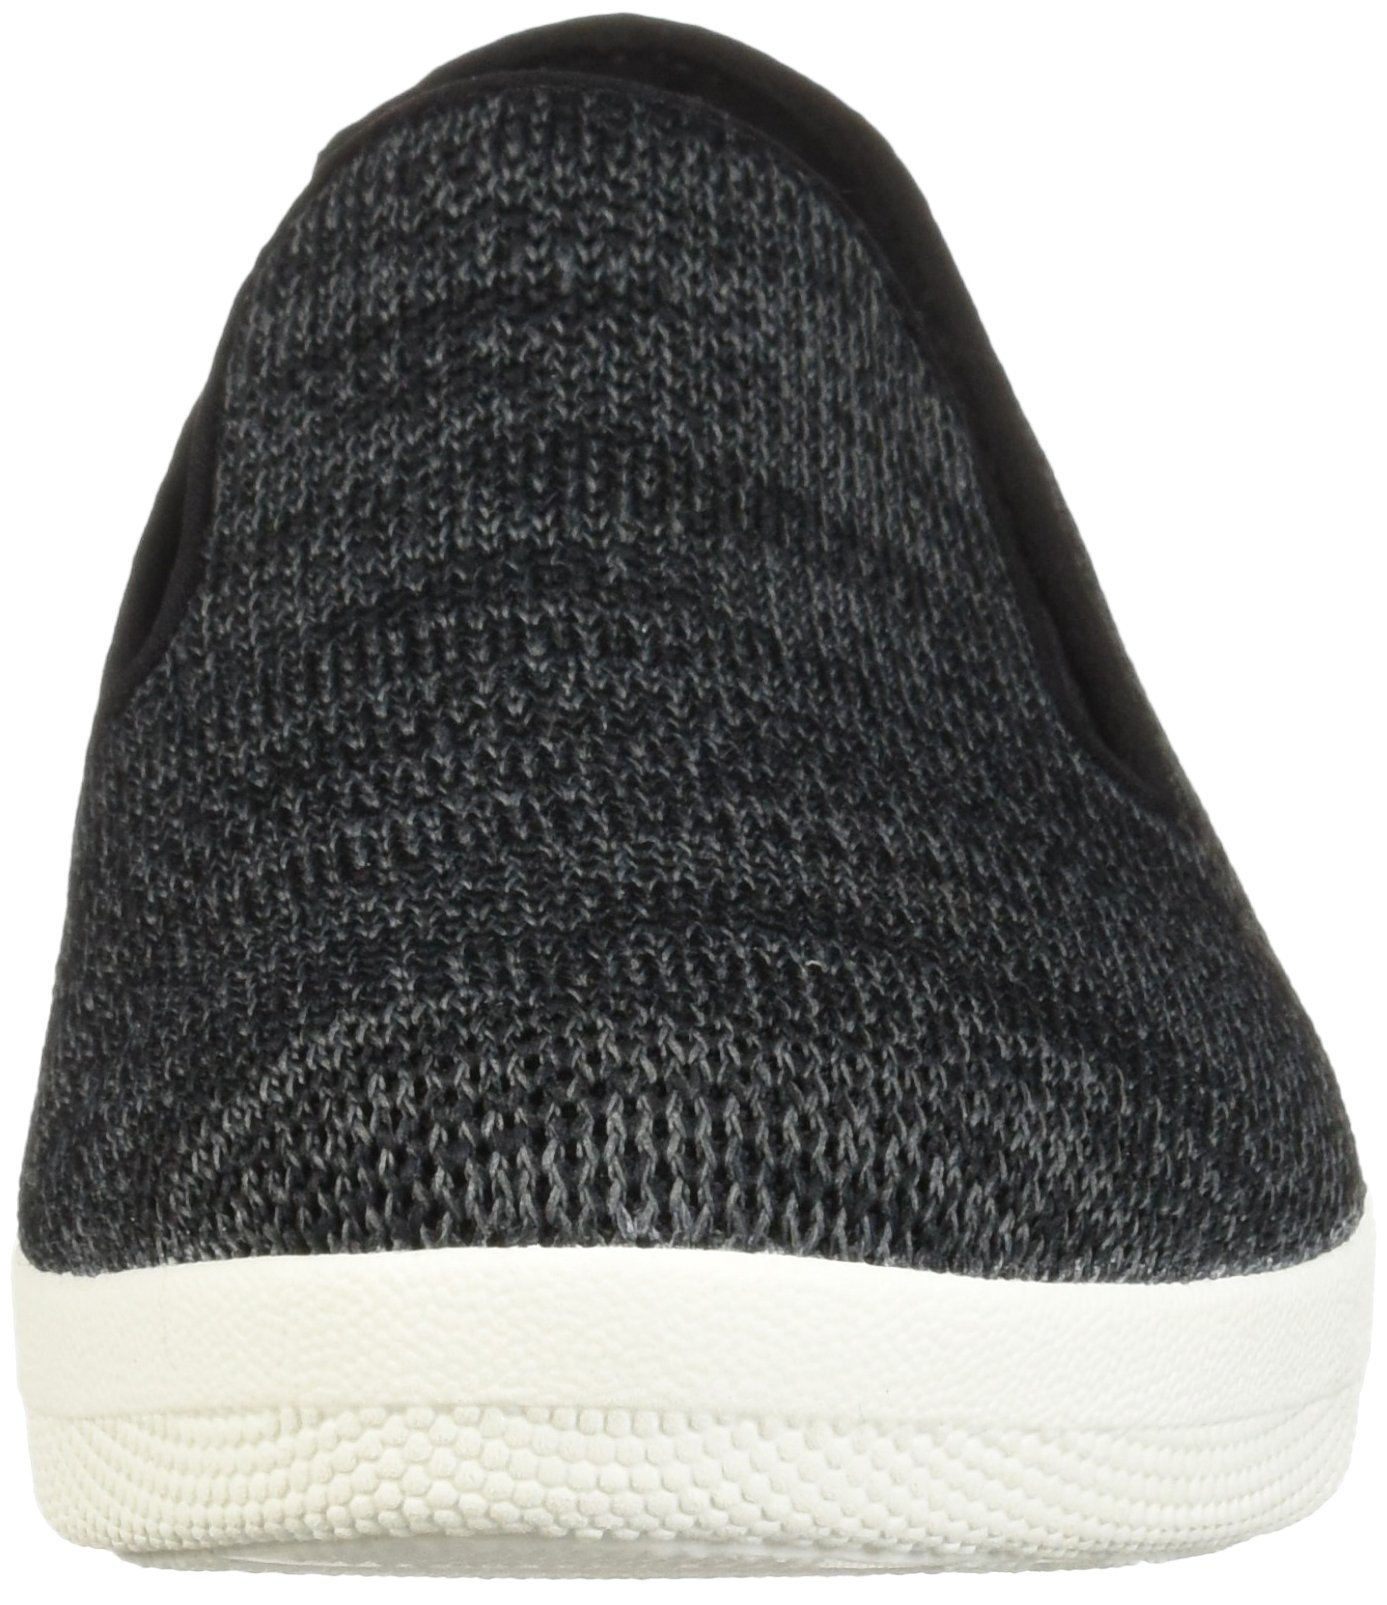 FitFlop Women's Superskate Uberknit Loafers, Black/Soft Grey, 8.5 M US by FitFlop (Image #4)